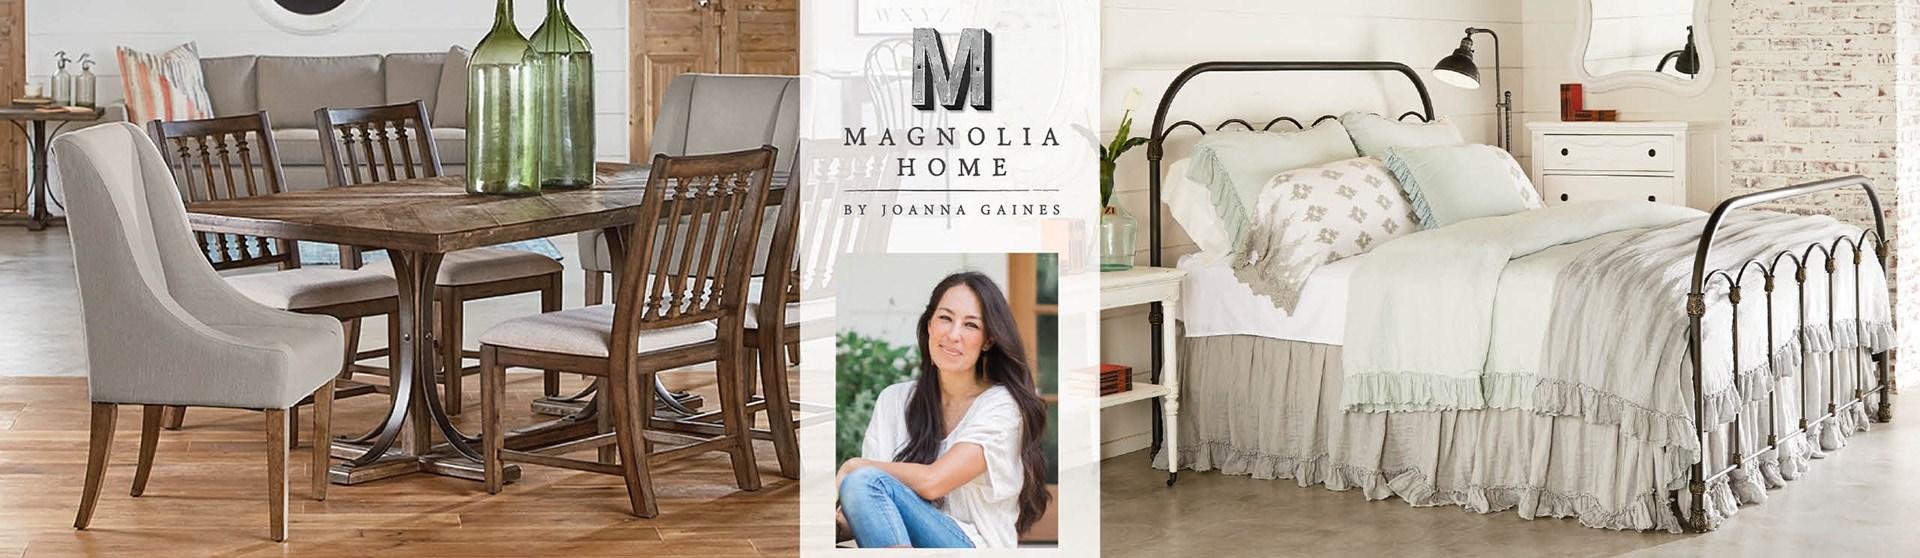 Magnolia Home Grand Furniture Prices